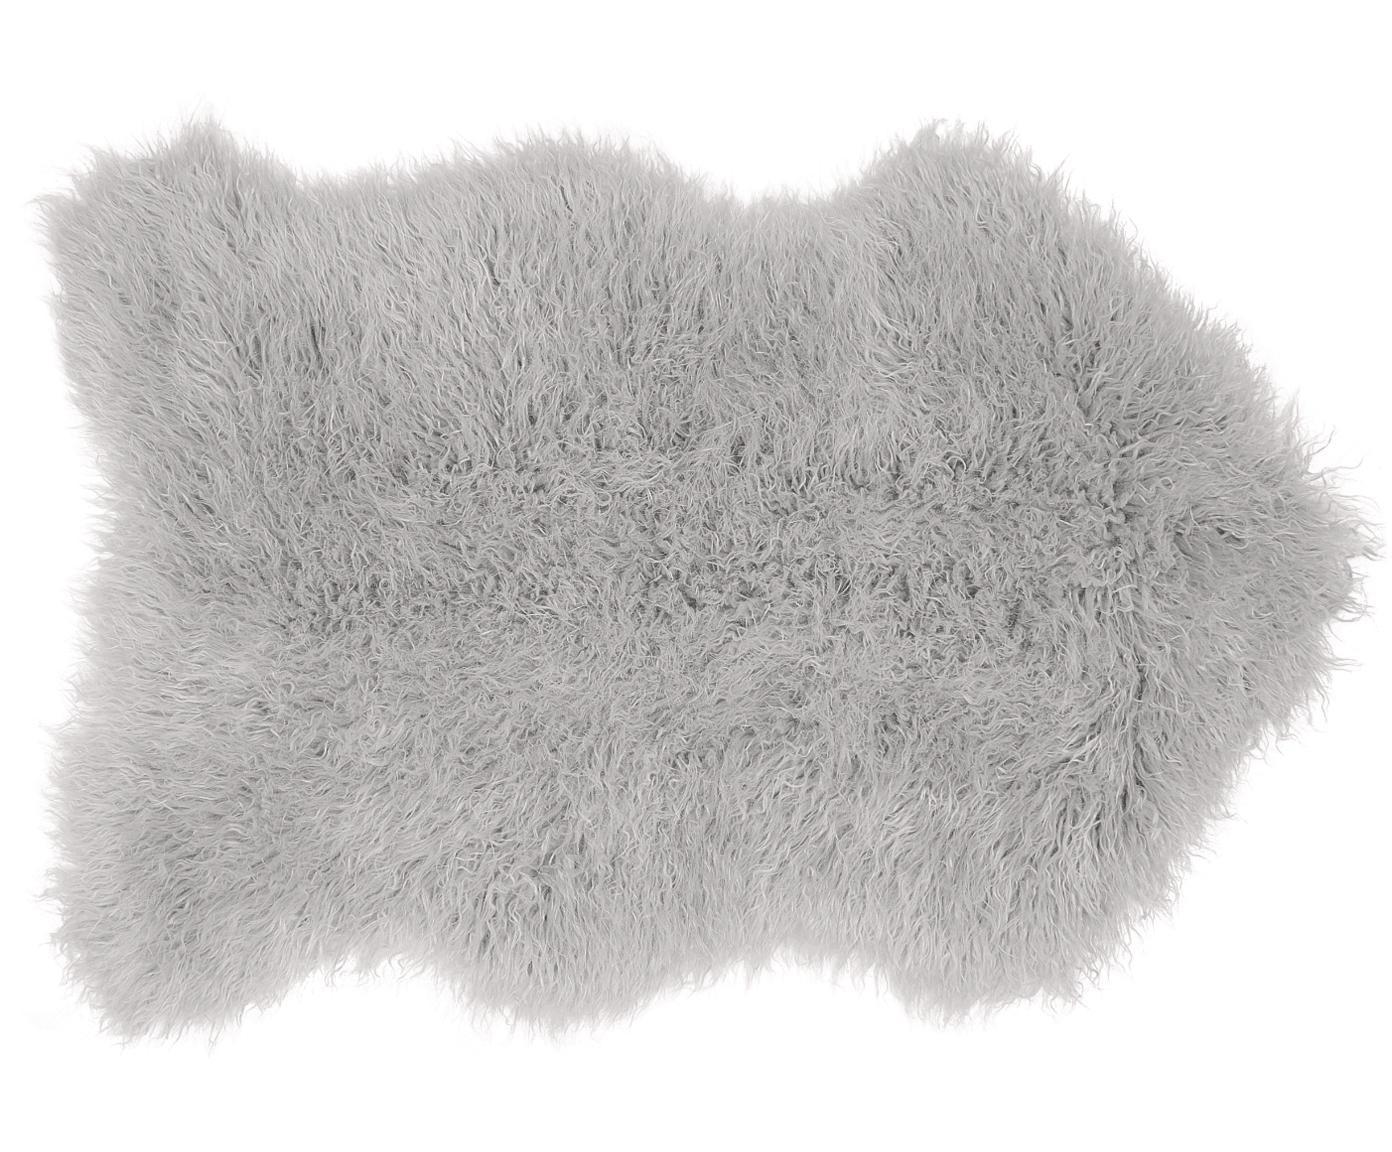 Imitatie schapenvacht Morten, gekruld, Bovenzijde: 67% acryl, 33% polyester, Onderzijde: polyester, Lichtgrijs, 60 x 90 cm